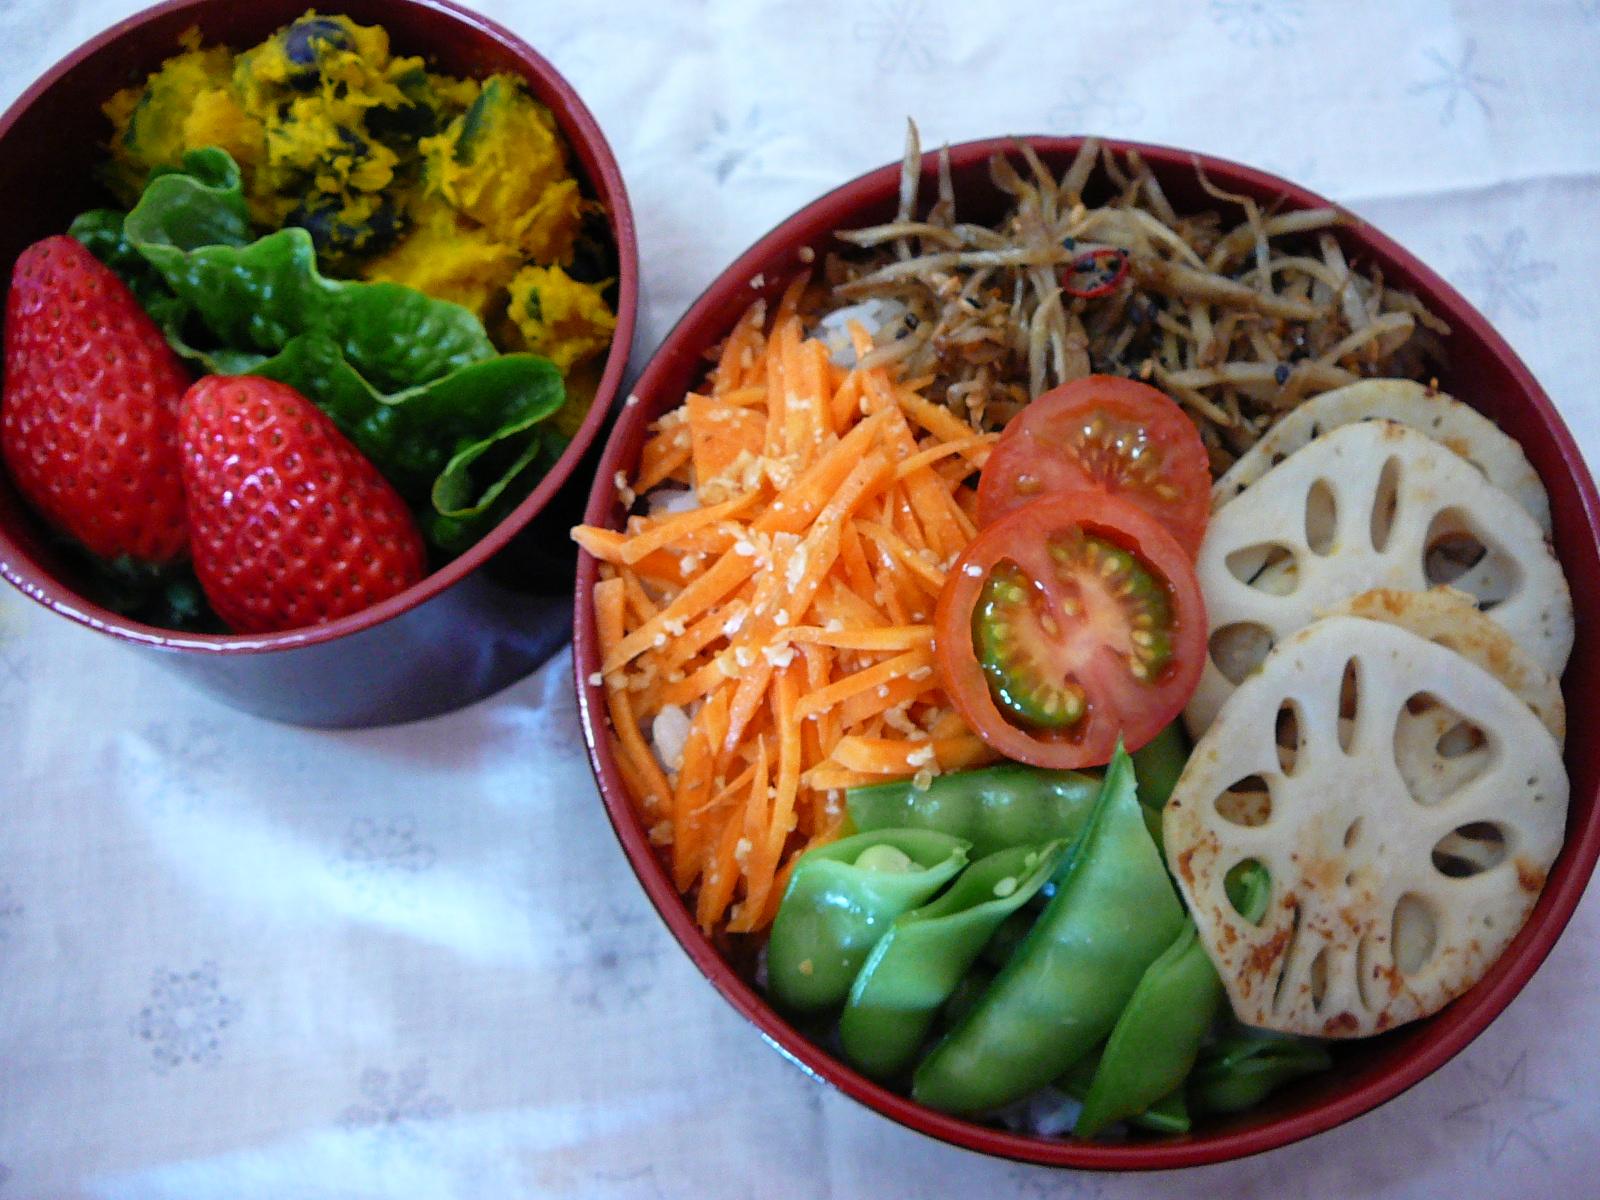 today s lunch box bento 11 12 vegan vegetarian sushi bento shizuoka gourmet. Black Bedroom Furniture Sets. Home Design Ideas